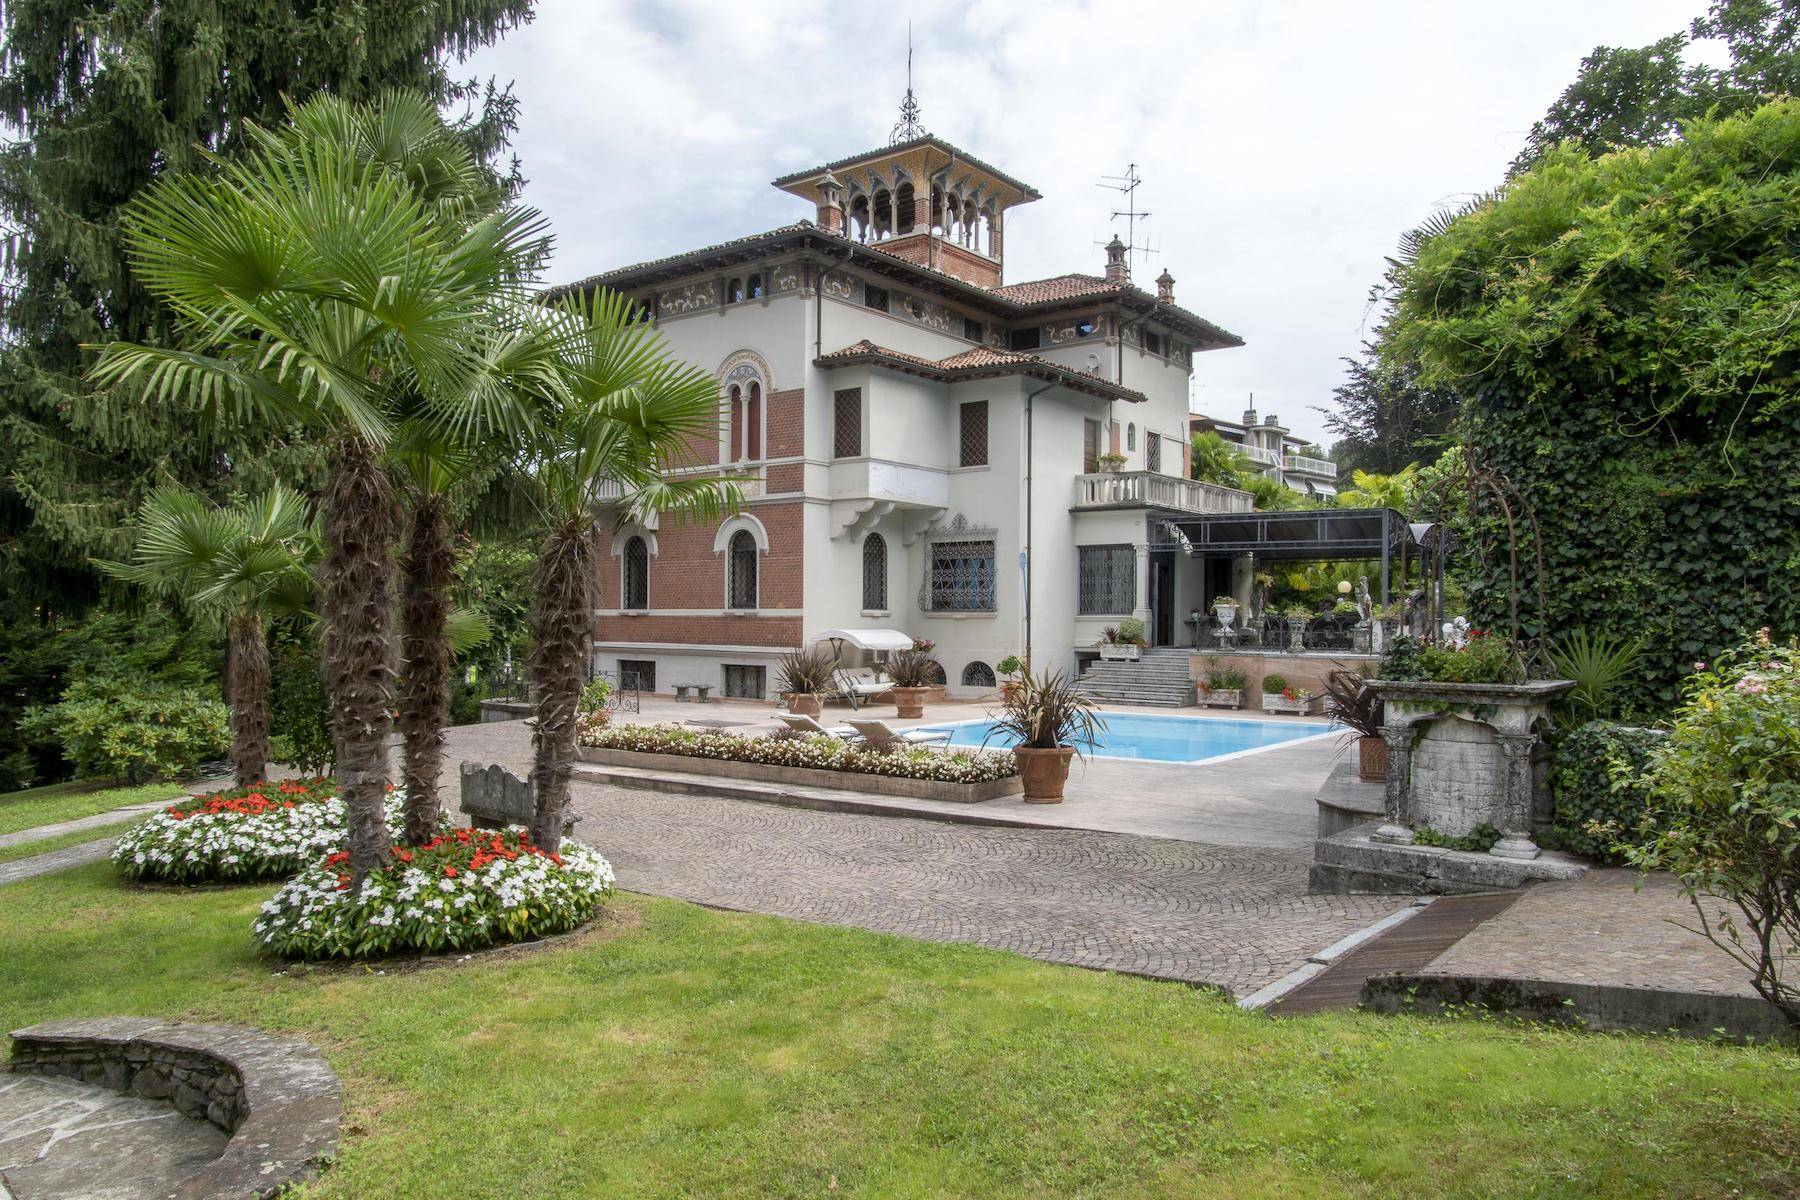 Villa in Vendita a Stresa: 5 locali, 700 mq - Foto 10